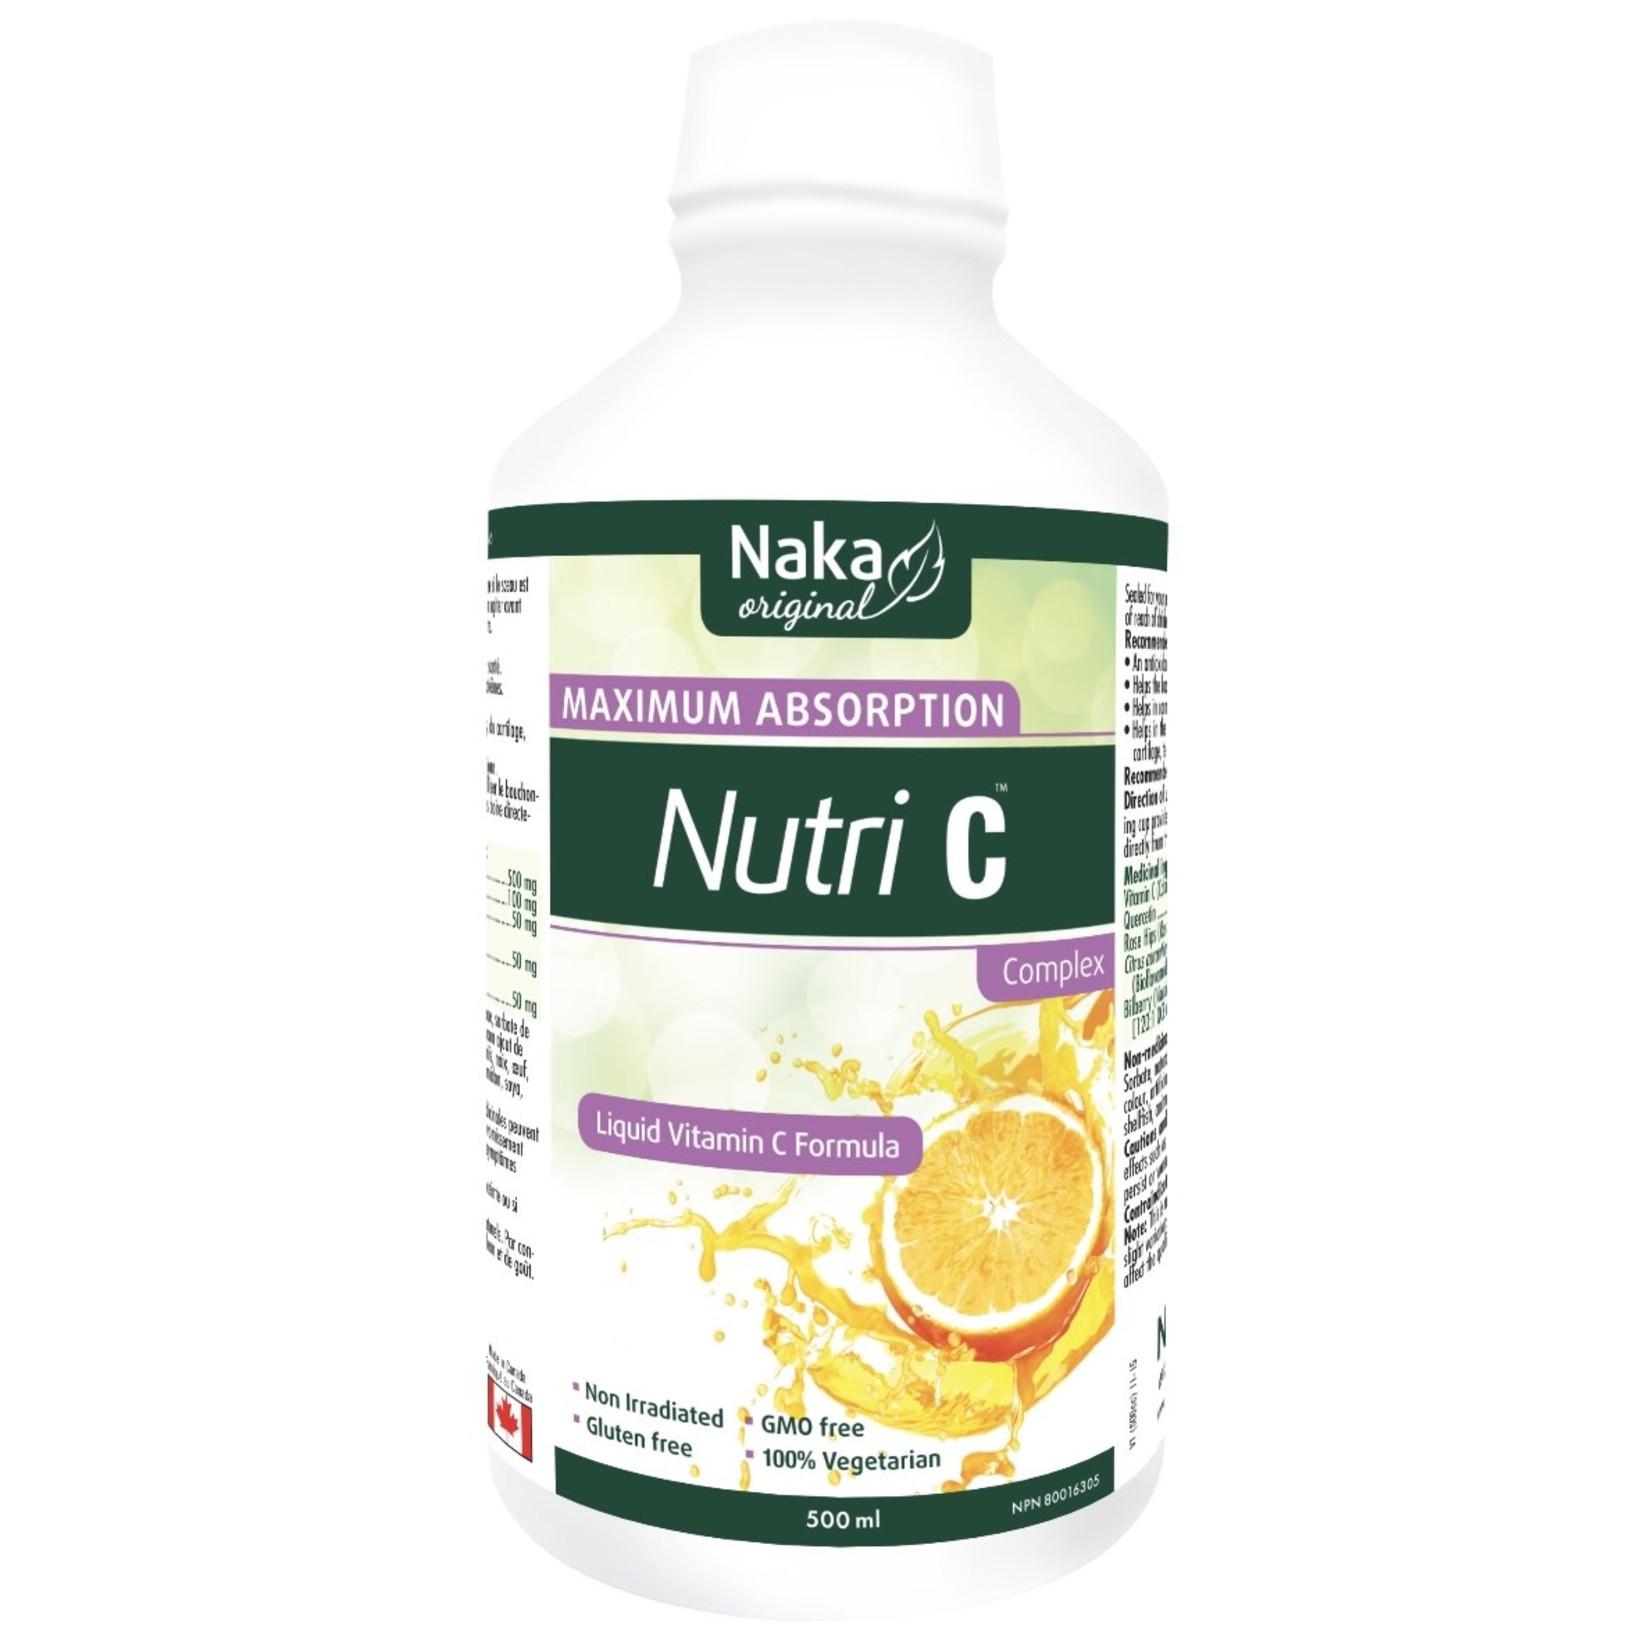 Naka Naka Nutri C 500ml